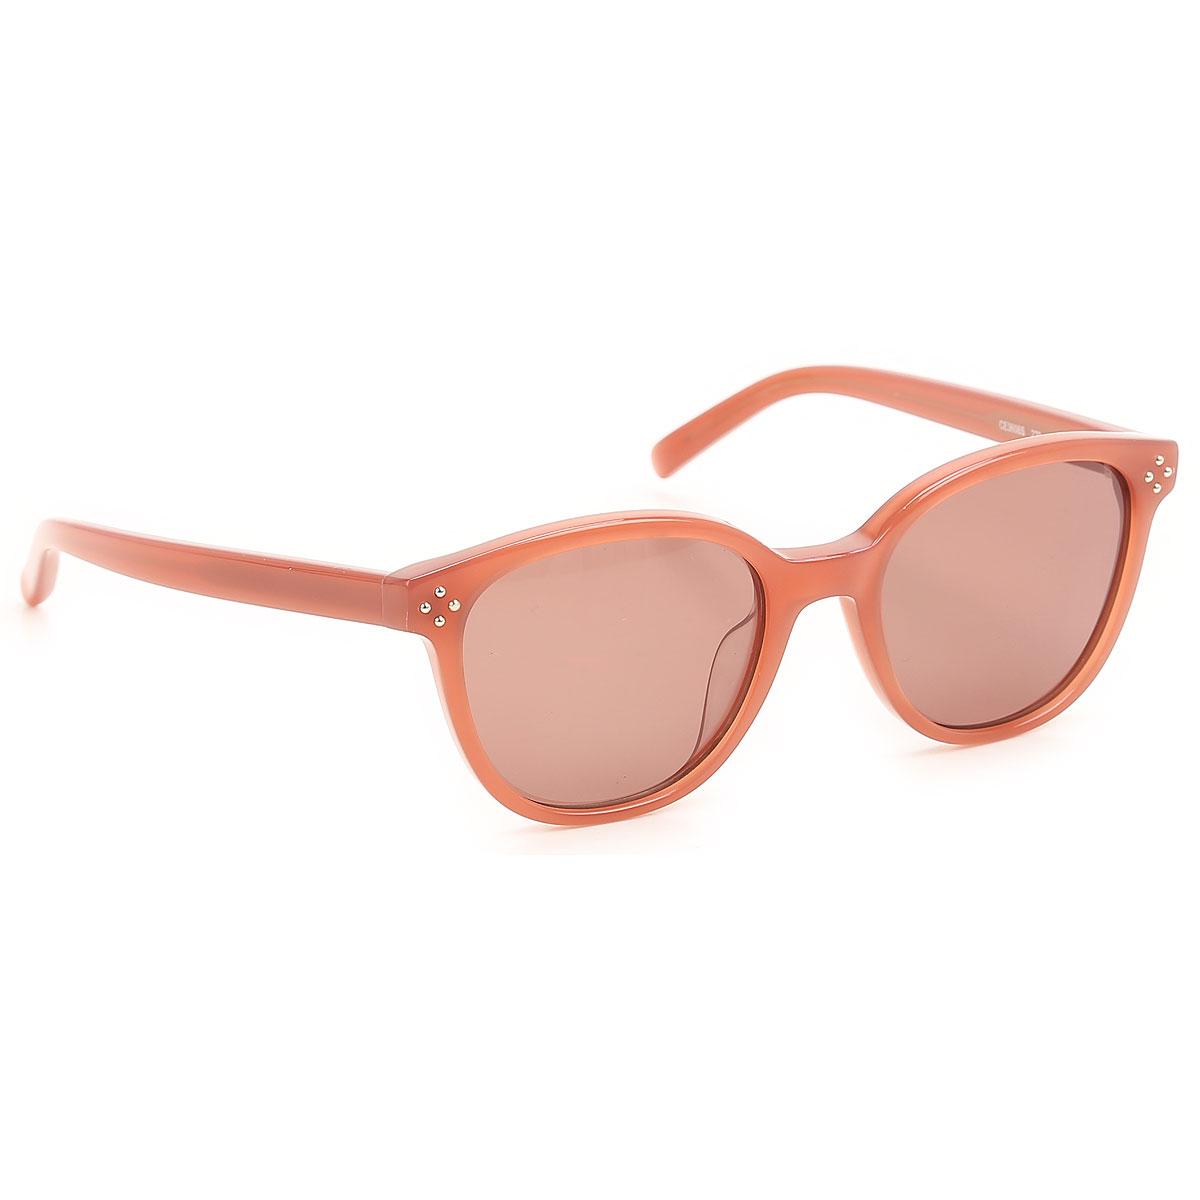 Image of Chloe Kids Sunglasses for Girls On Sale, Brick, 2017